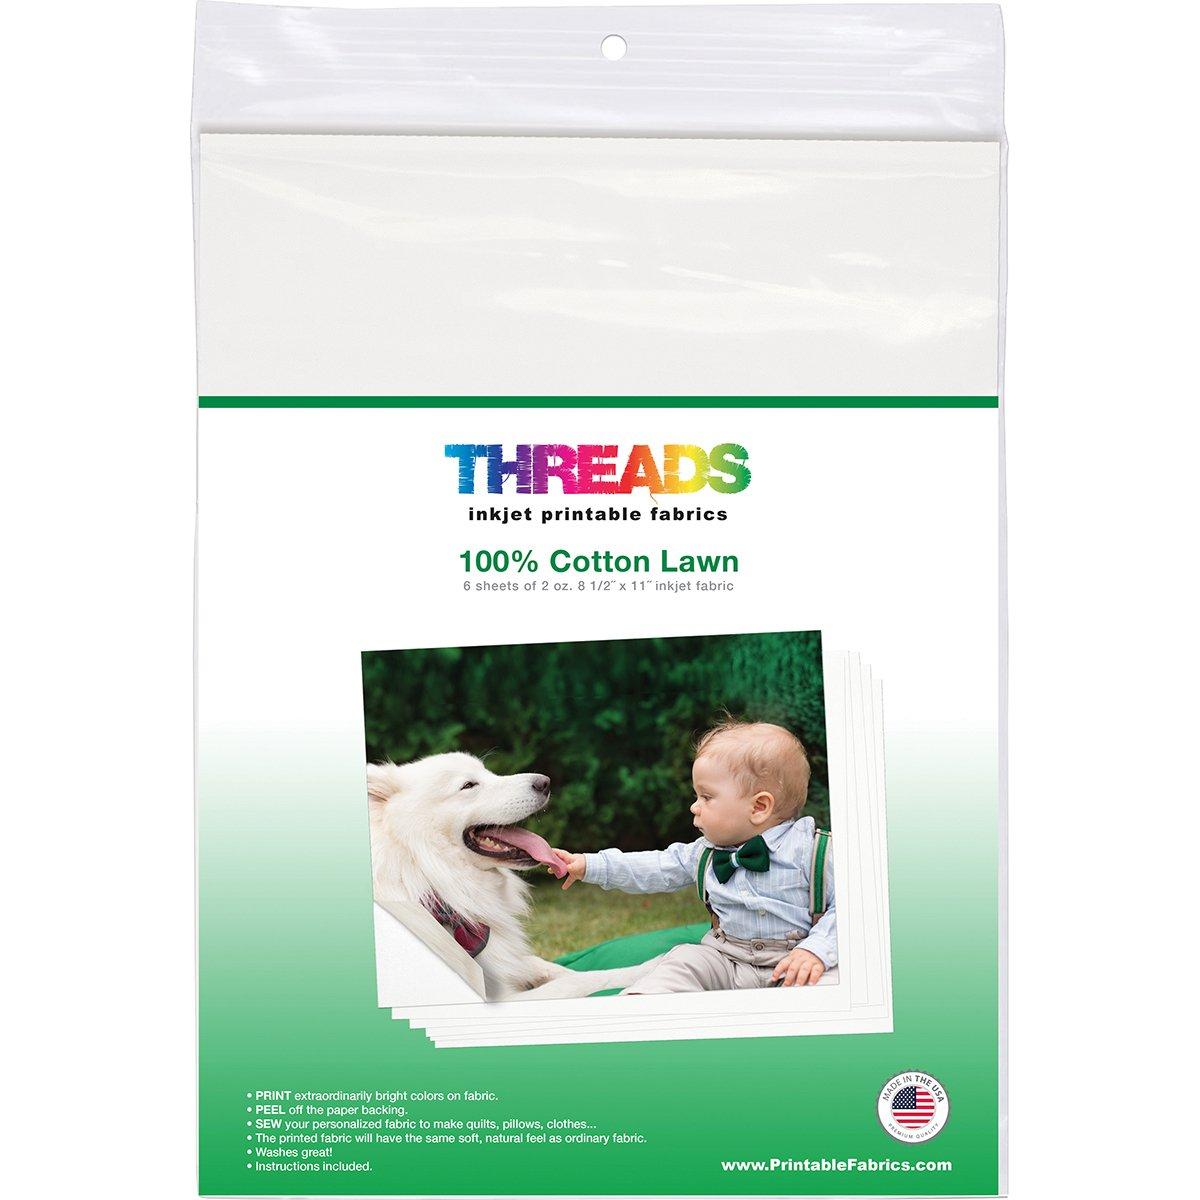 Threads TXIT100620 Inkjet Printable Fabric Sheets 8.5''x11'' 6/Pkg